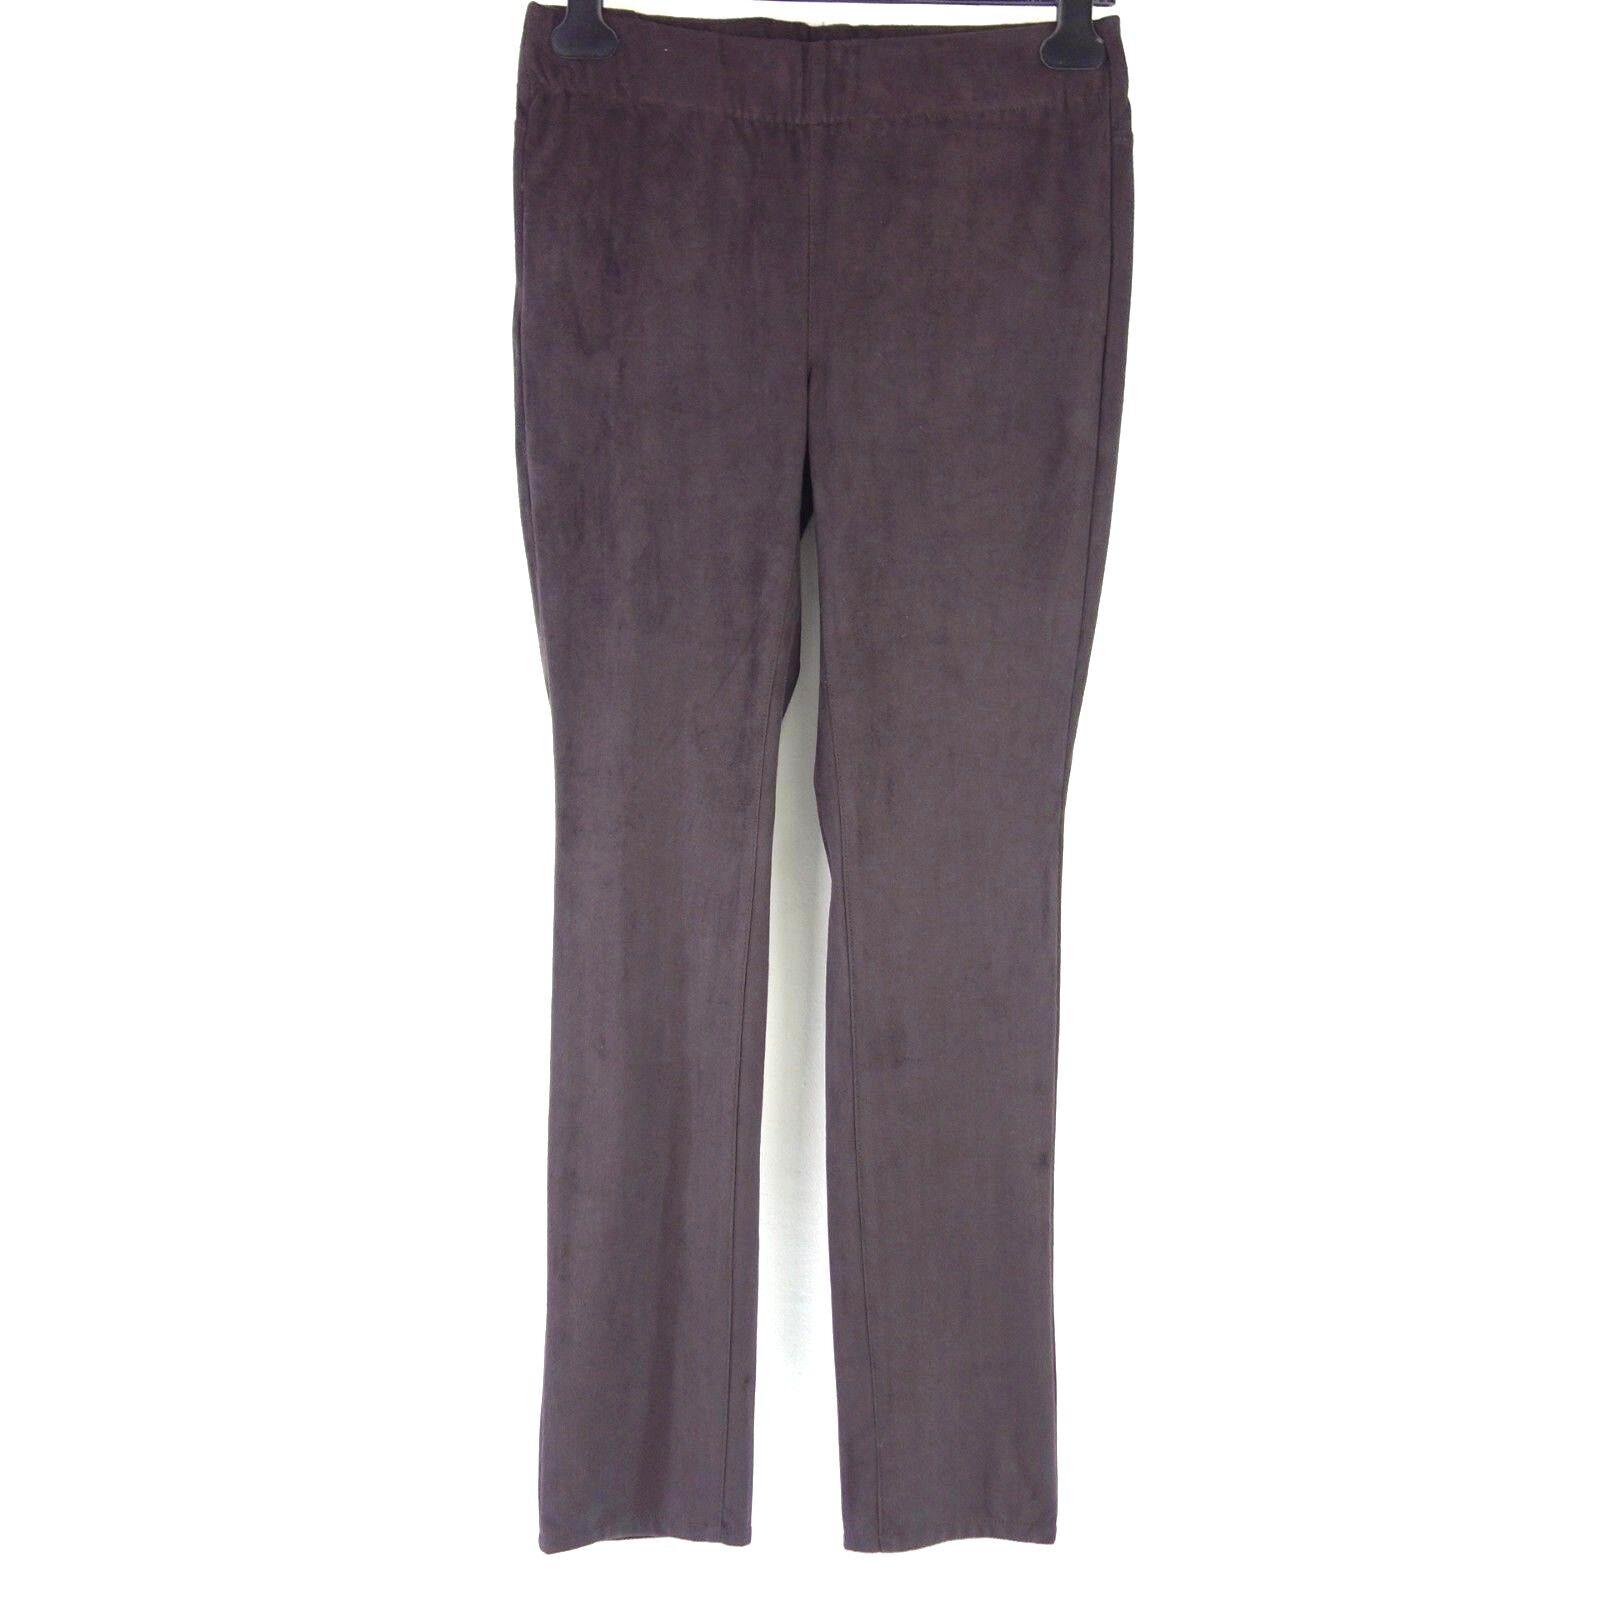 NYDJ Trousers Women's Leggings Us 6 de 36 Brown Suede Look Elastic Waistband